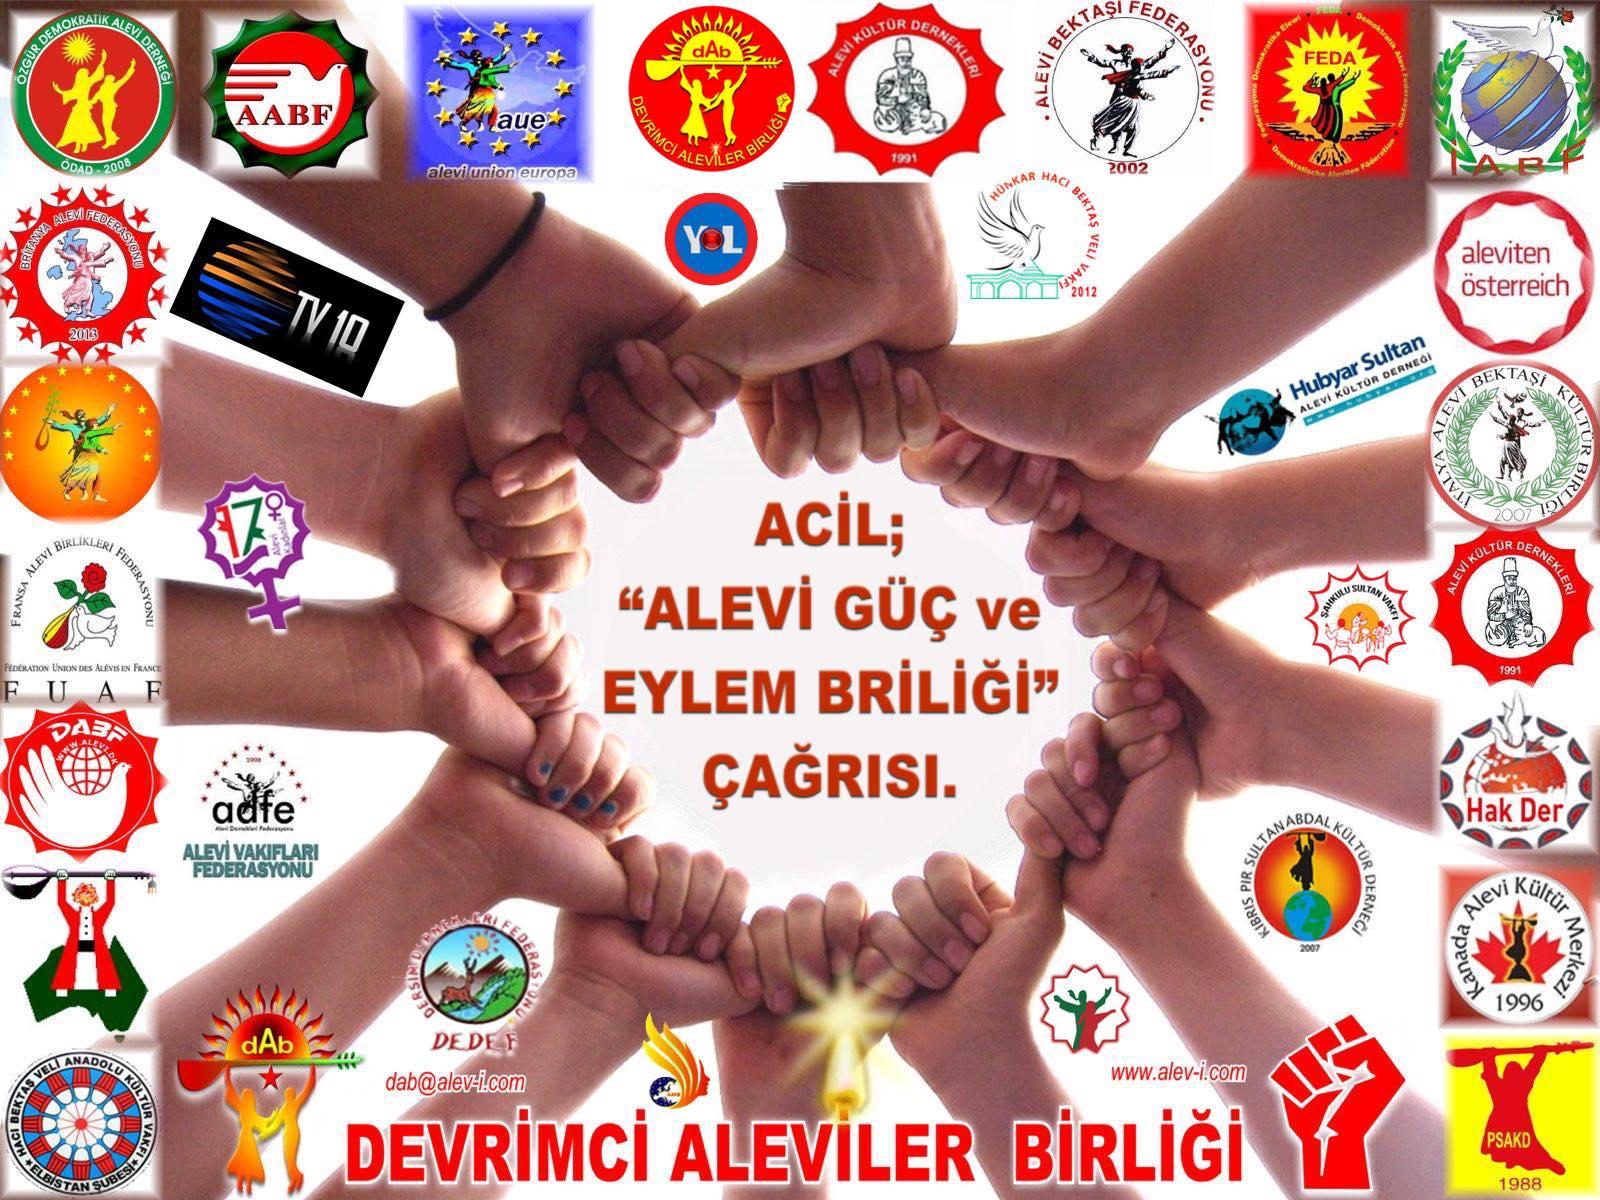 AGEB Devrimci Aleviler GUC birligi DAB cagrı logo2